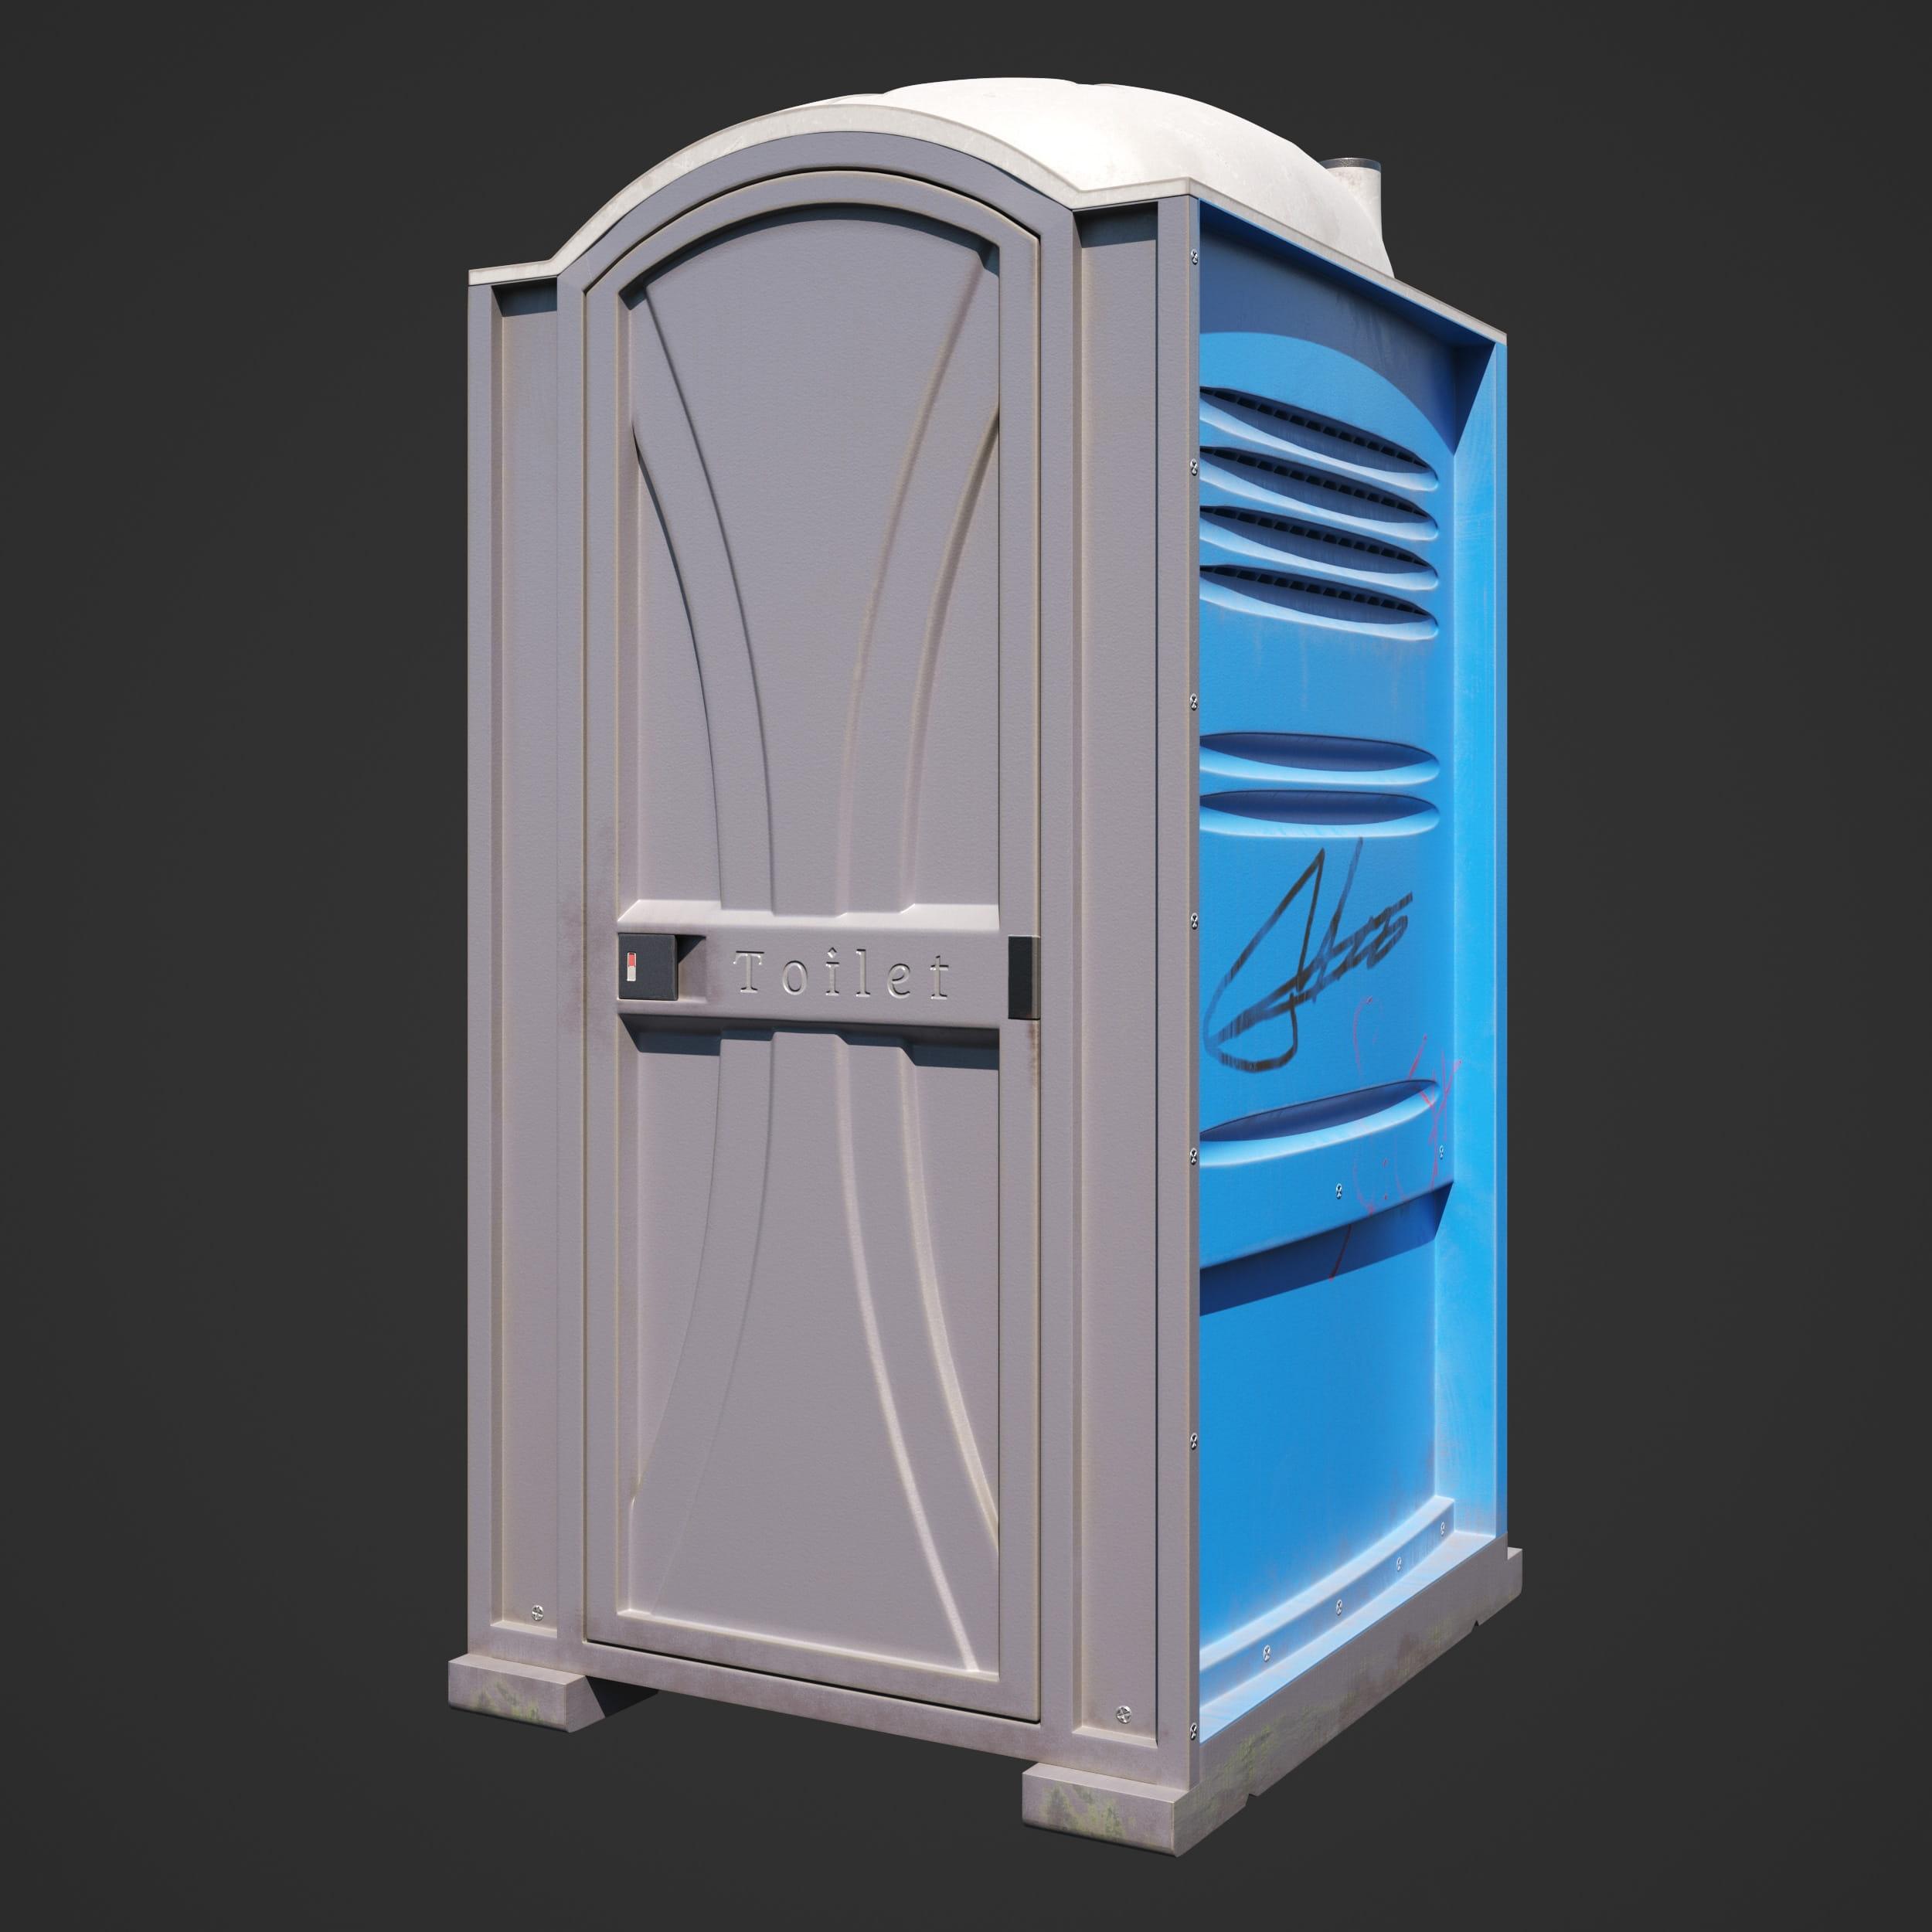 mobile toilet 59 AM246